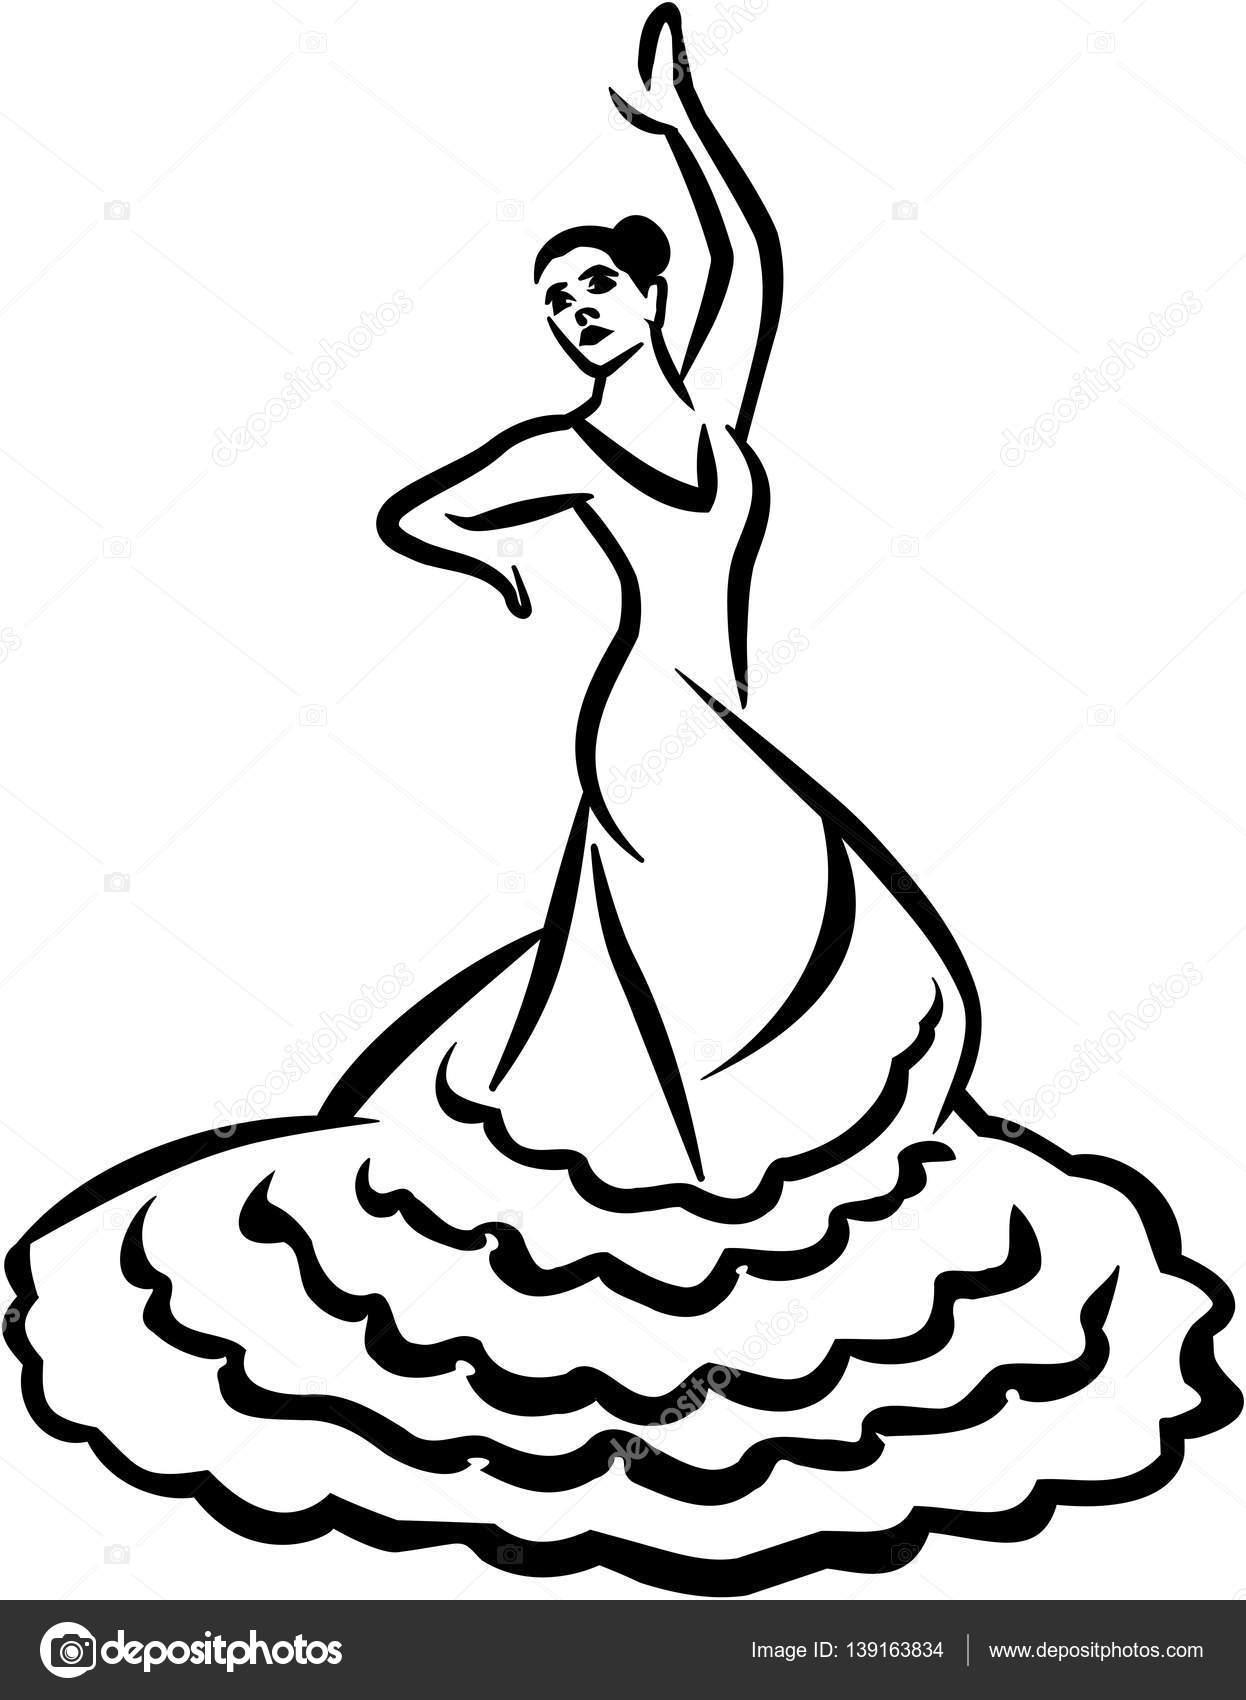 Danseuse de flamenco style de la calligraphie image - Dessin danseuse de flamenco ...